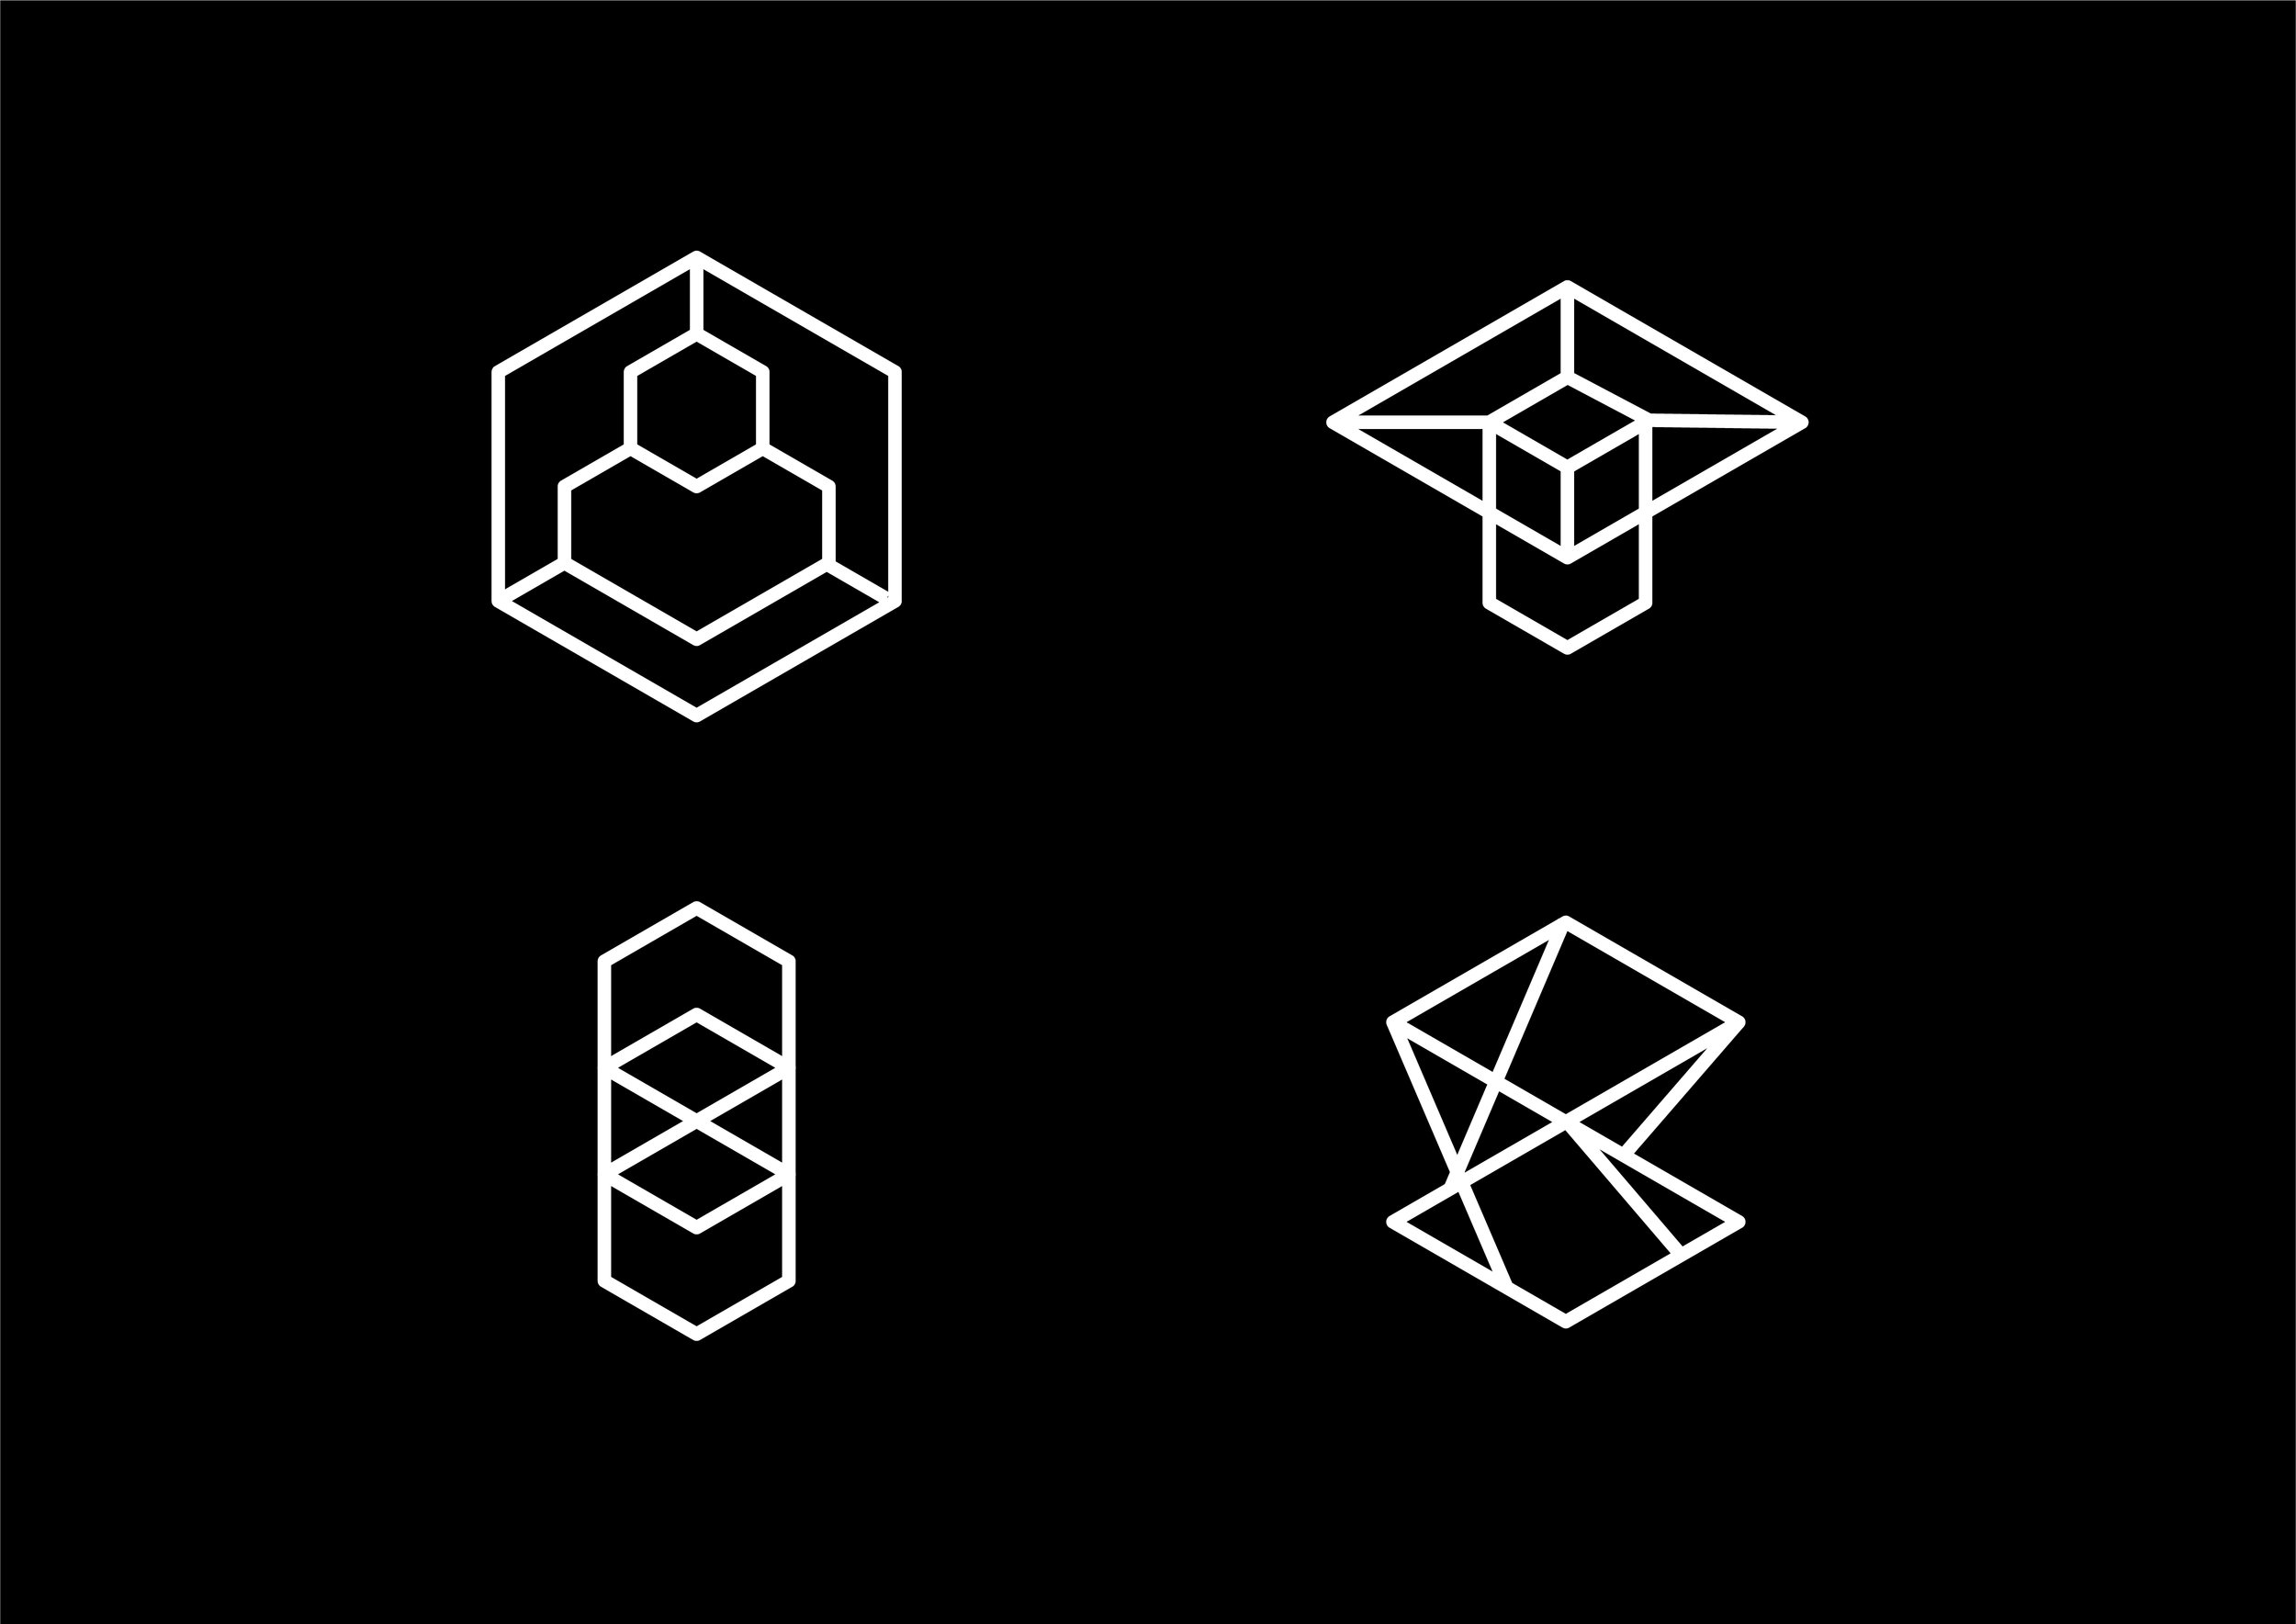 Lightbox geometry3-07.jpg